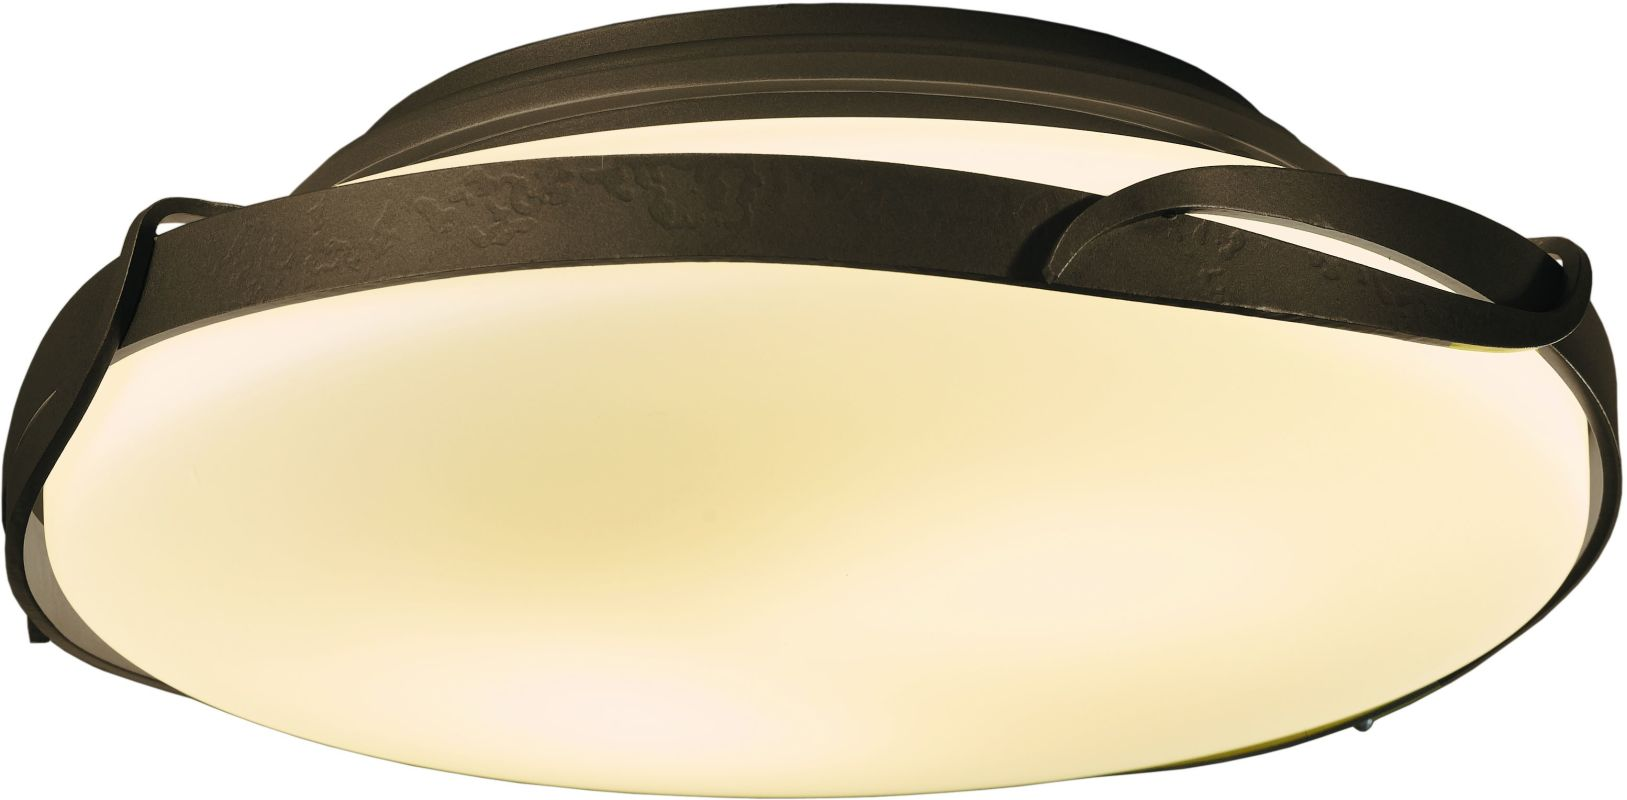 Hubbardton Forge 126740 2 Light Semi-Flush Ceiling Light from the Sale $431.20 ITEM#: 2007250 MODEL# :126740-05 :